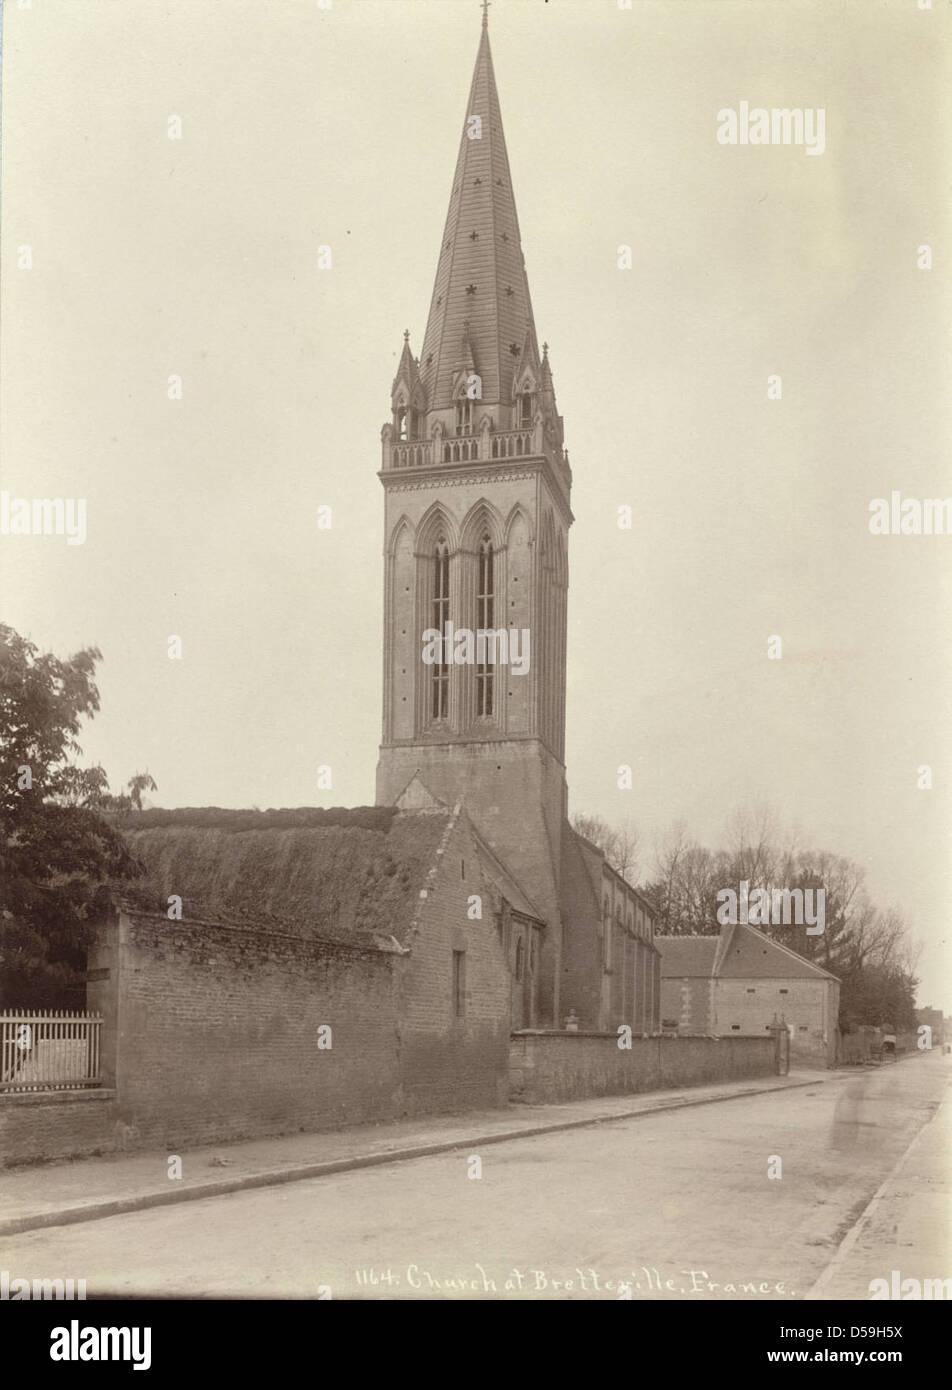 Church at Bretteville Stock Photo